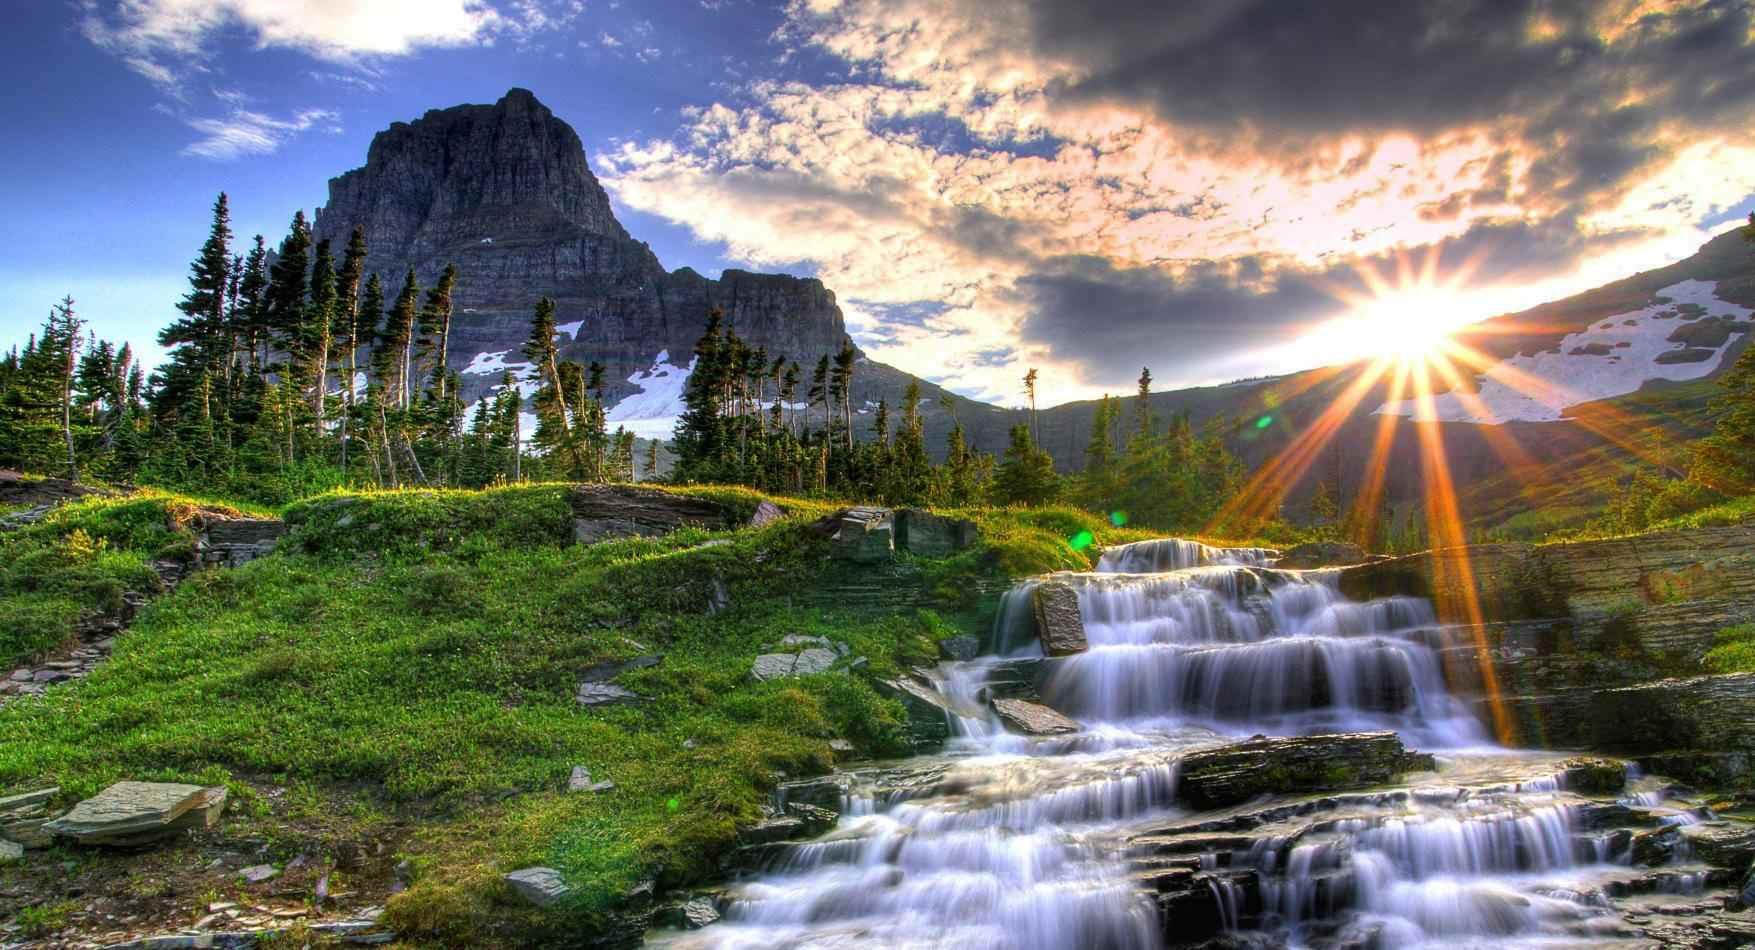 20-stunning-landscape-photography-stumbleupon-1